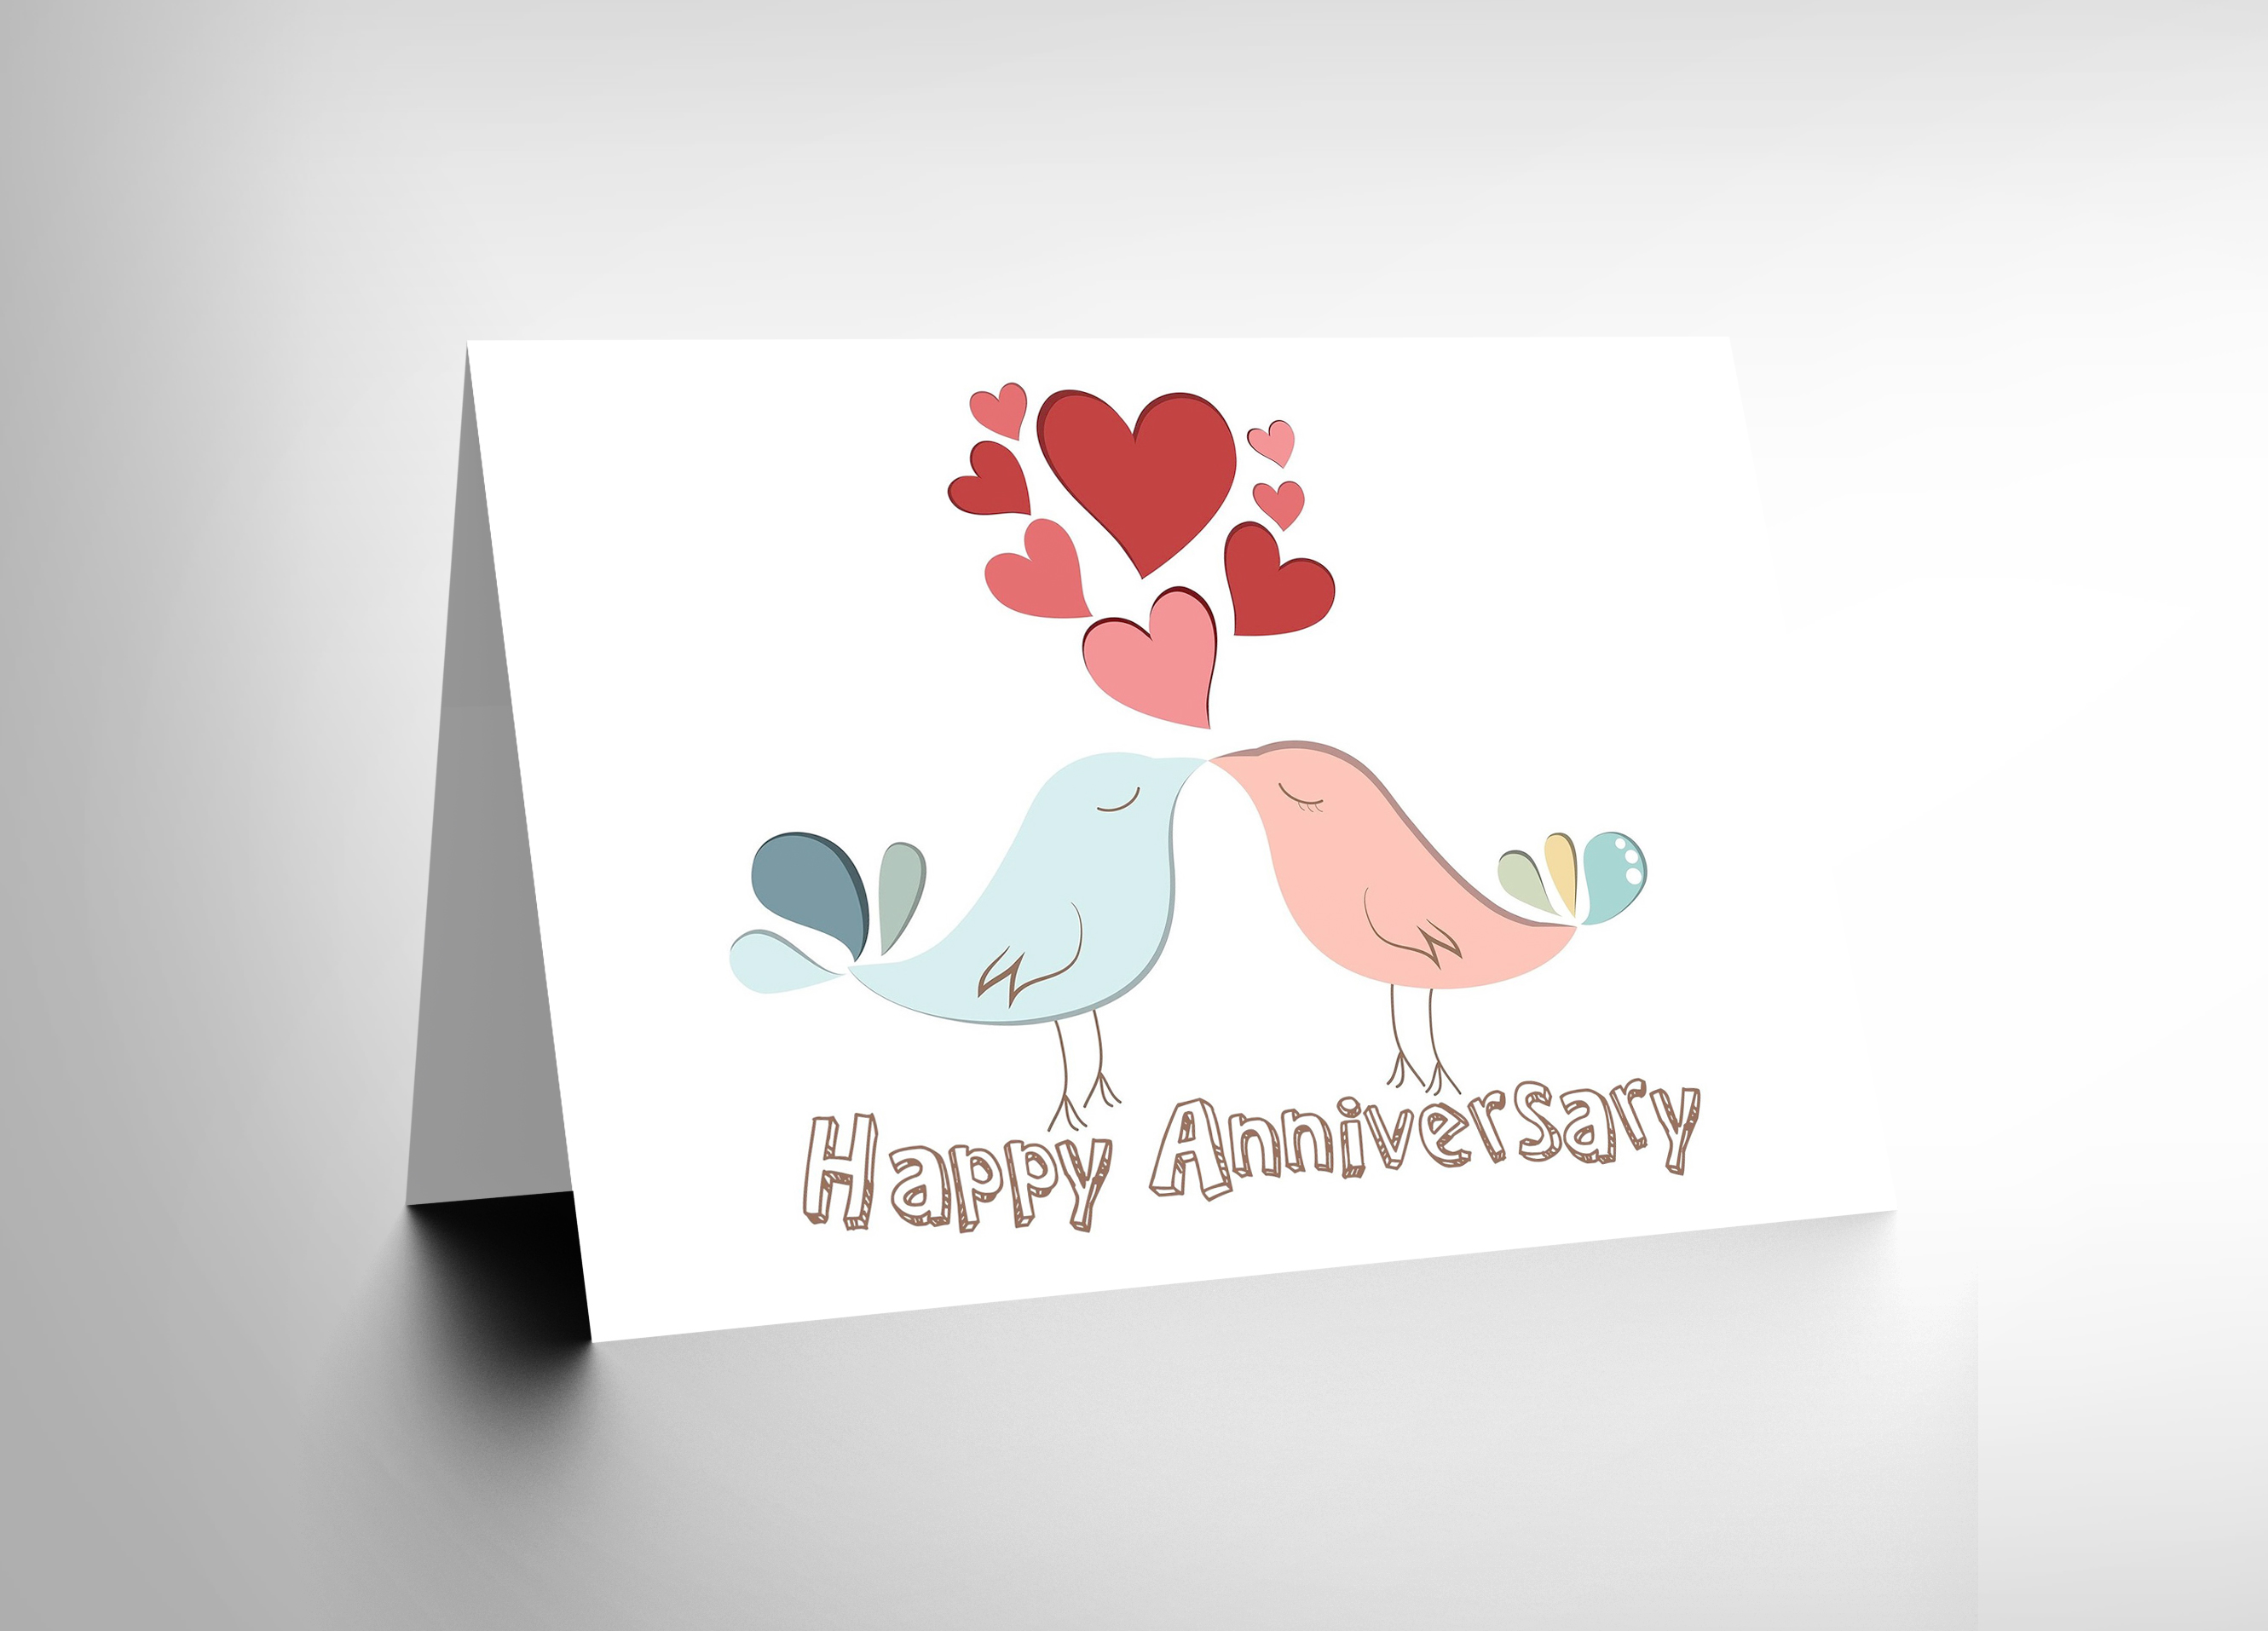 NEW HAPPY ANNIVERSARY VALENTINES LOVE BIRDS COUPLE BLANK